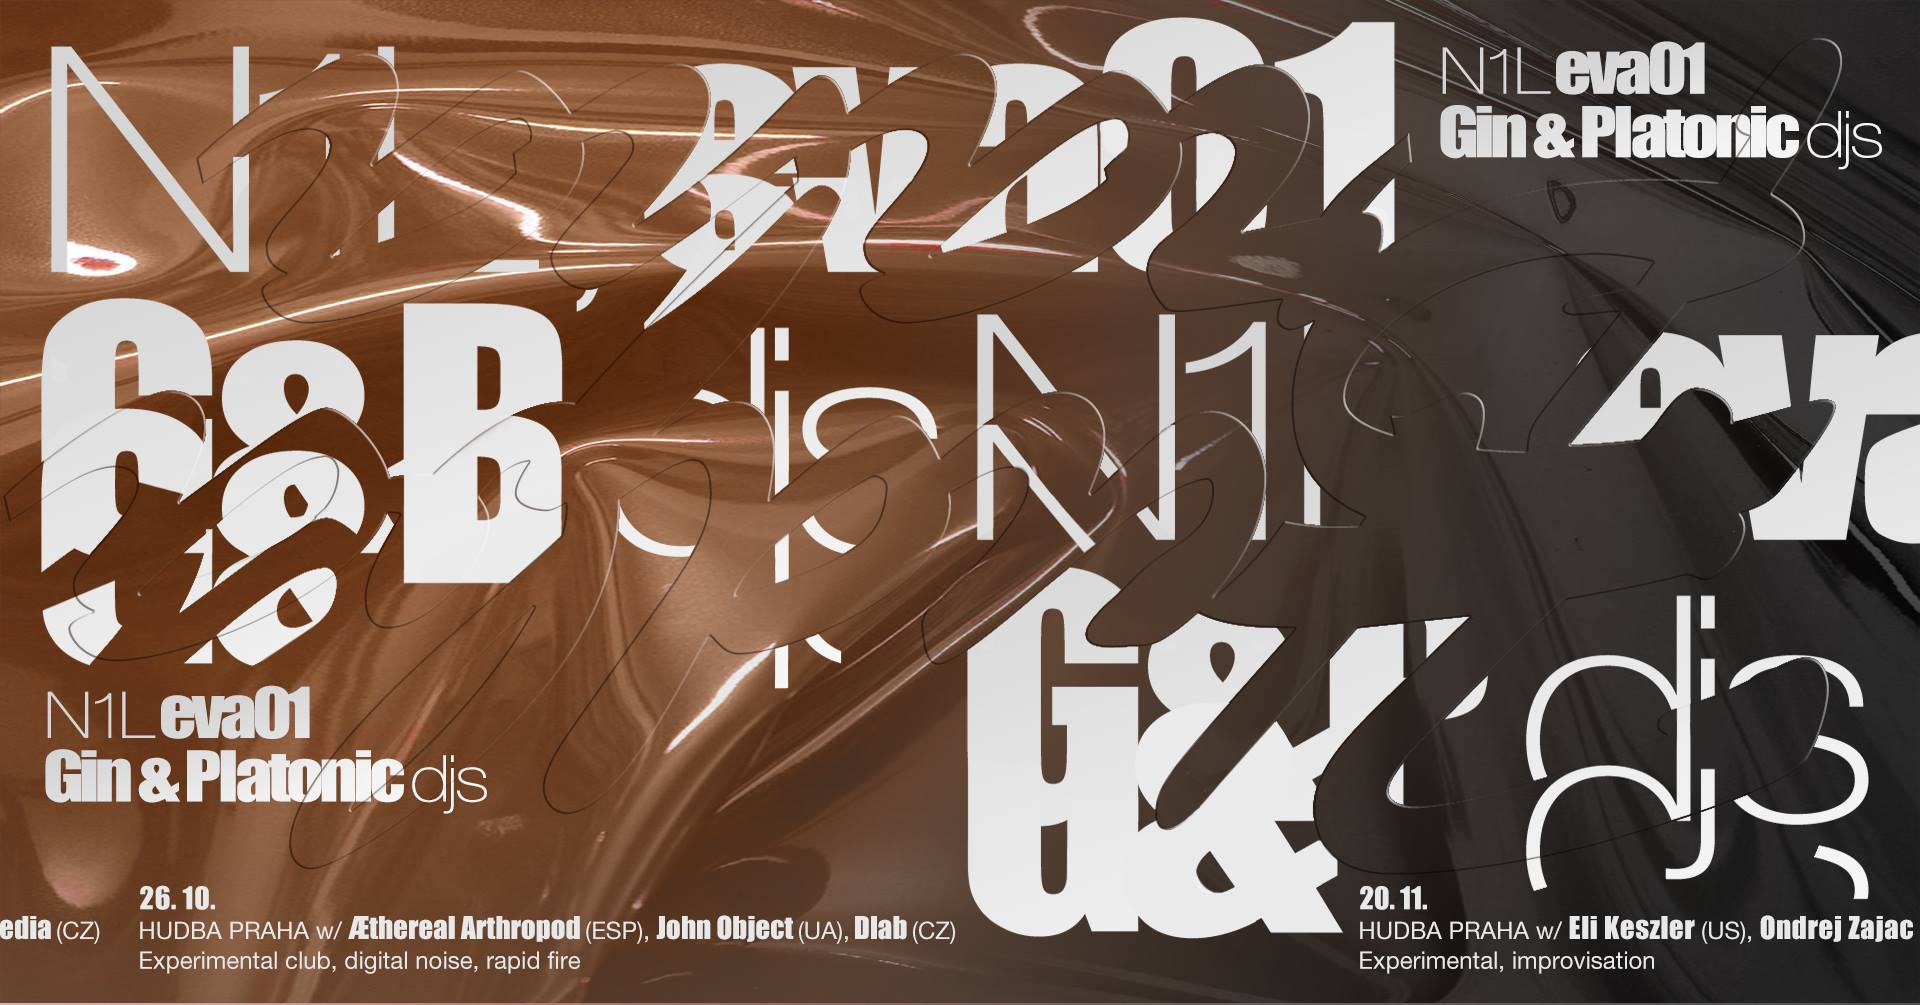 PÁ / 16.11. / 21.00 / HUDBA PRAHA & Gin&Platonic w/ N1L (LVA/DE), eva01 (CZ), G&P djs (CZ) / koncert, dj set